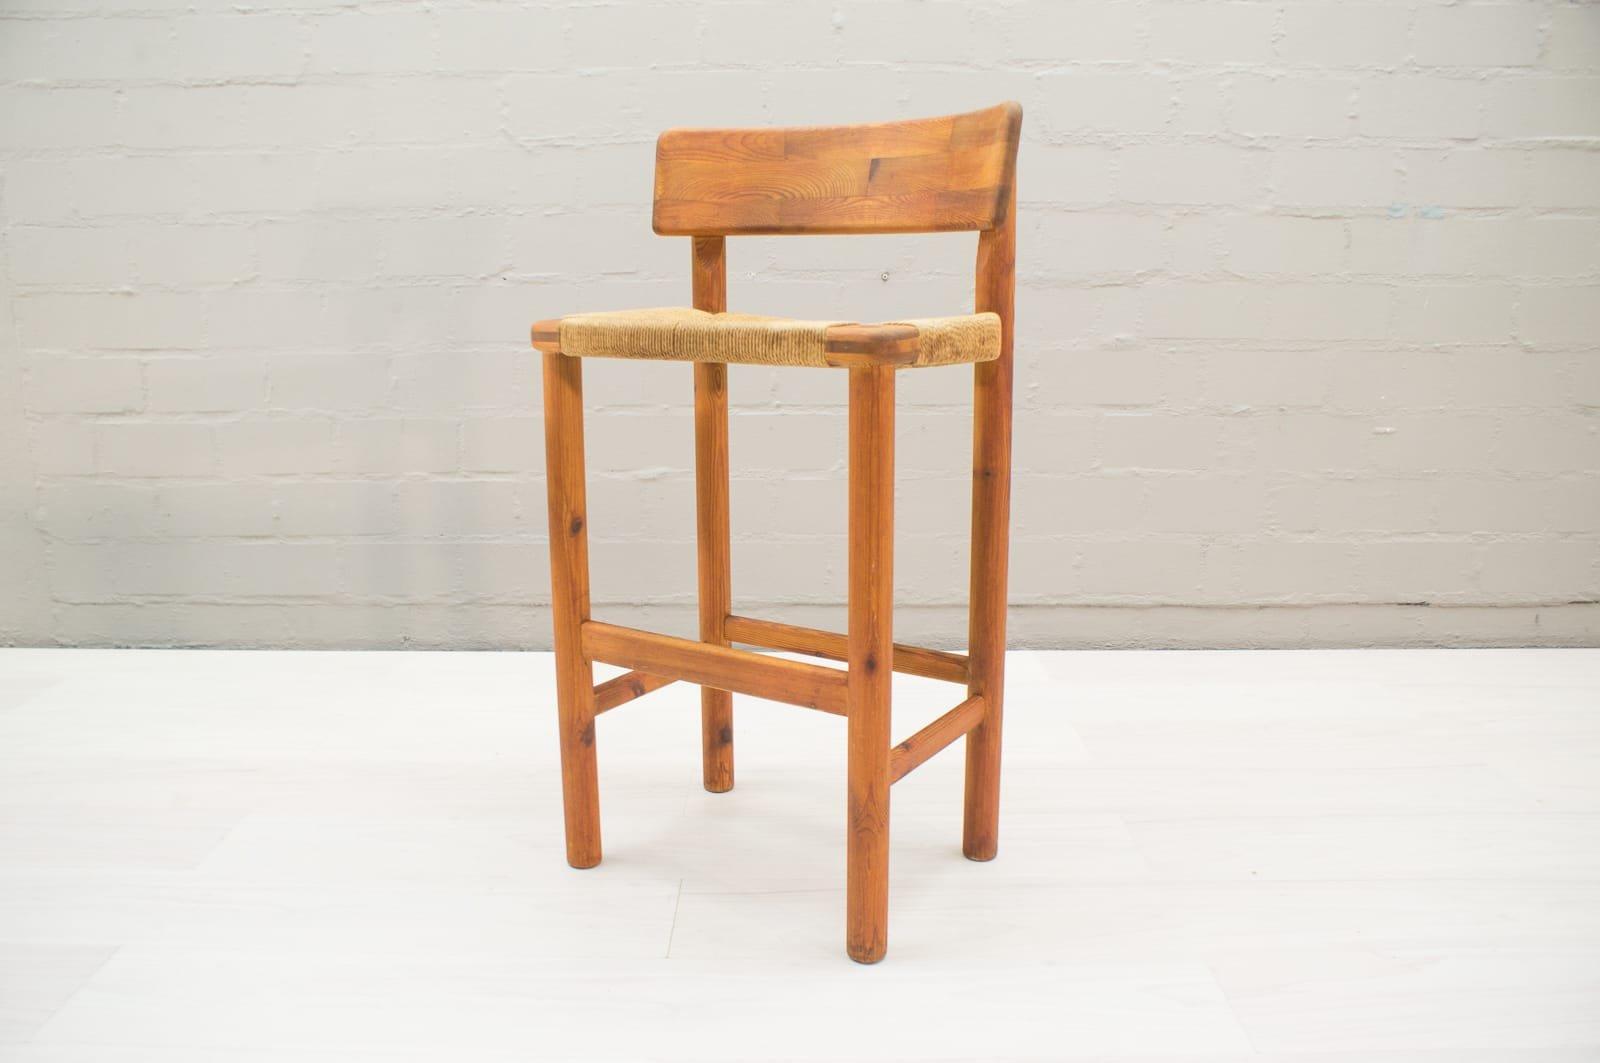 skandinavische barhocker aus holz 1960er 2er set bei pamono kaufen. Black Bedroom Furniture Sets. Home Design Ideas